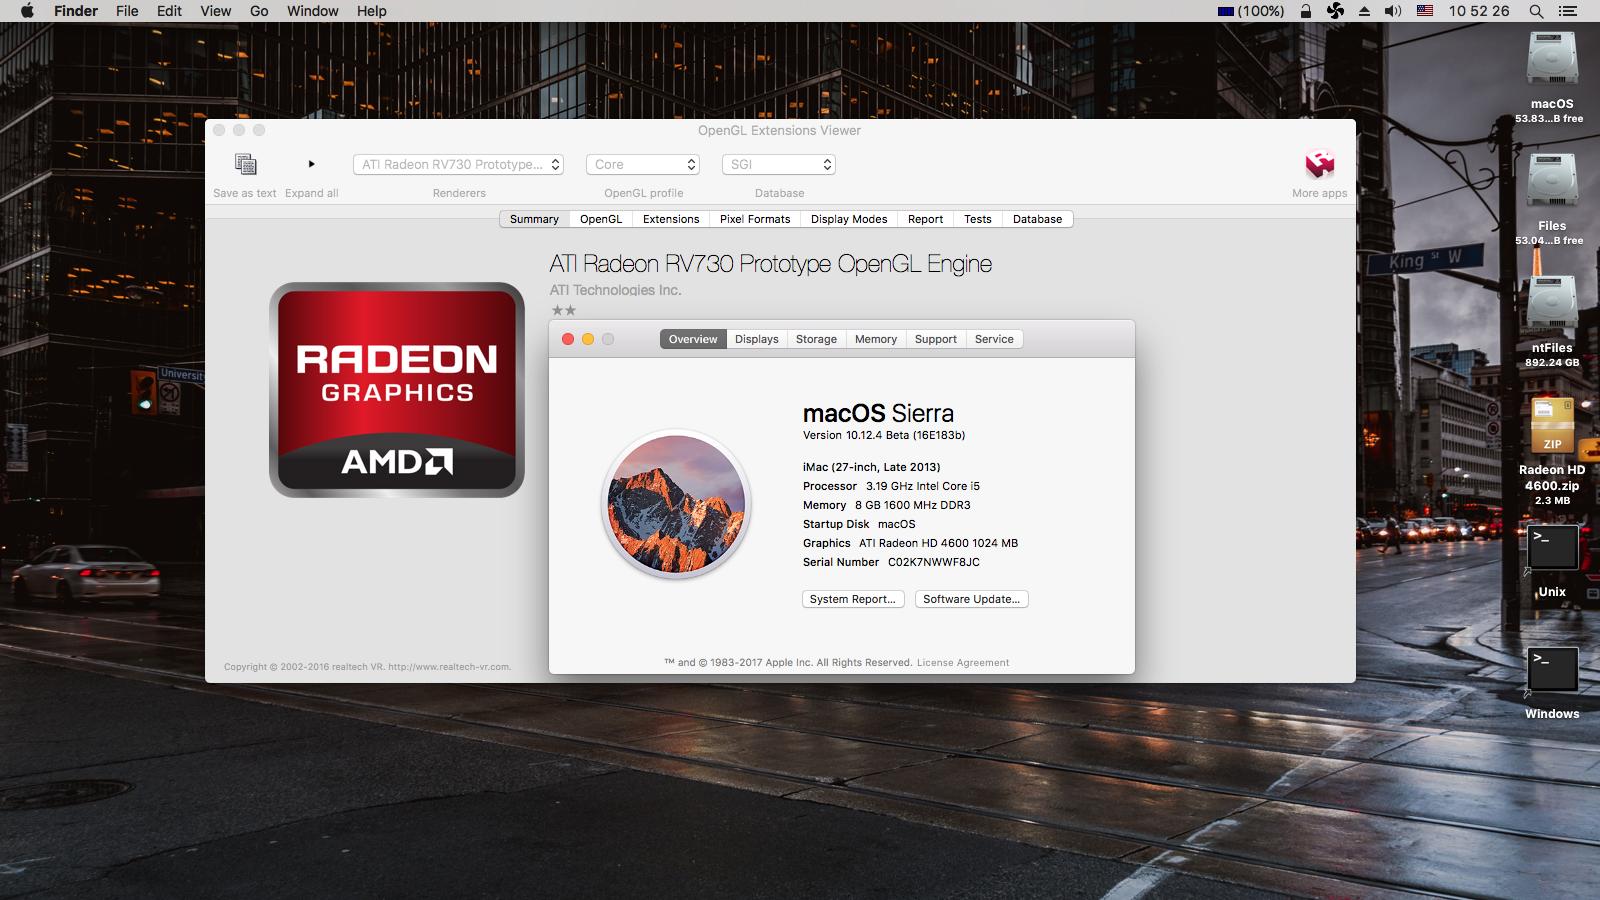 Ati 5 16e183b Beta - 12 For Radeon 4 net 4650 Sierra Osx86 Hd 10